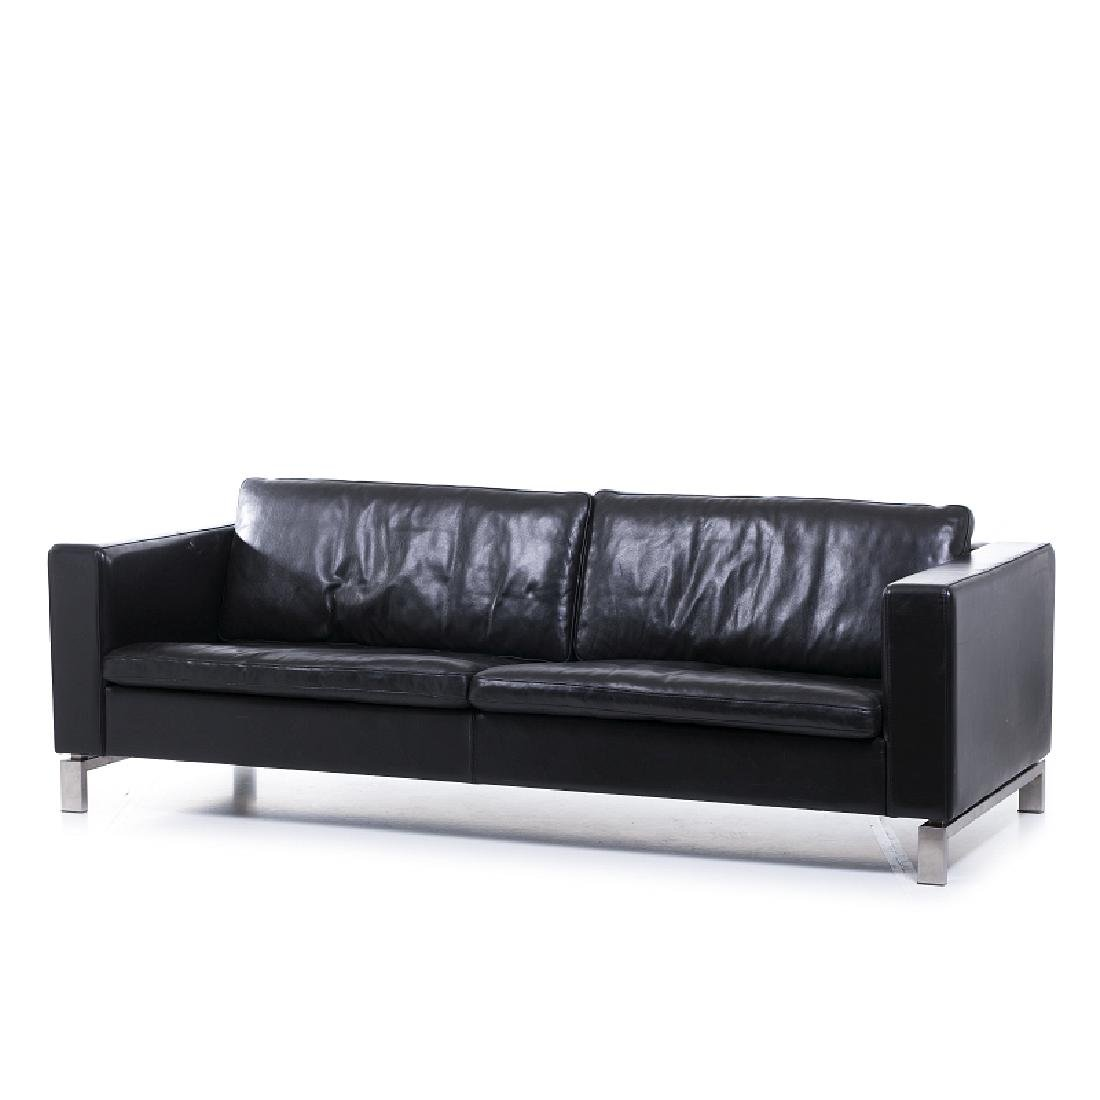 Modernist three-seat sofa